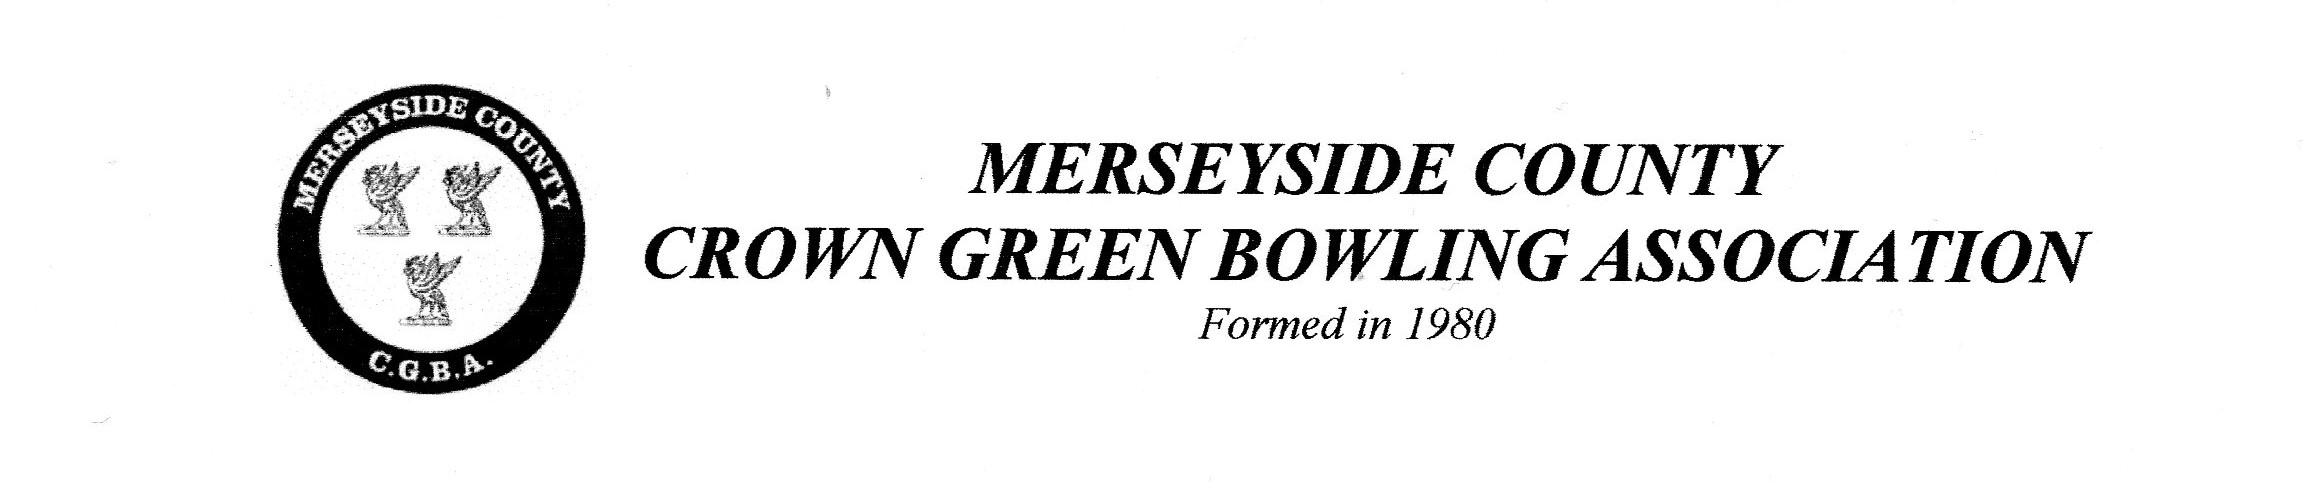 Merseyside bowls